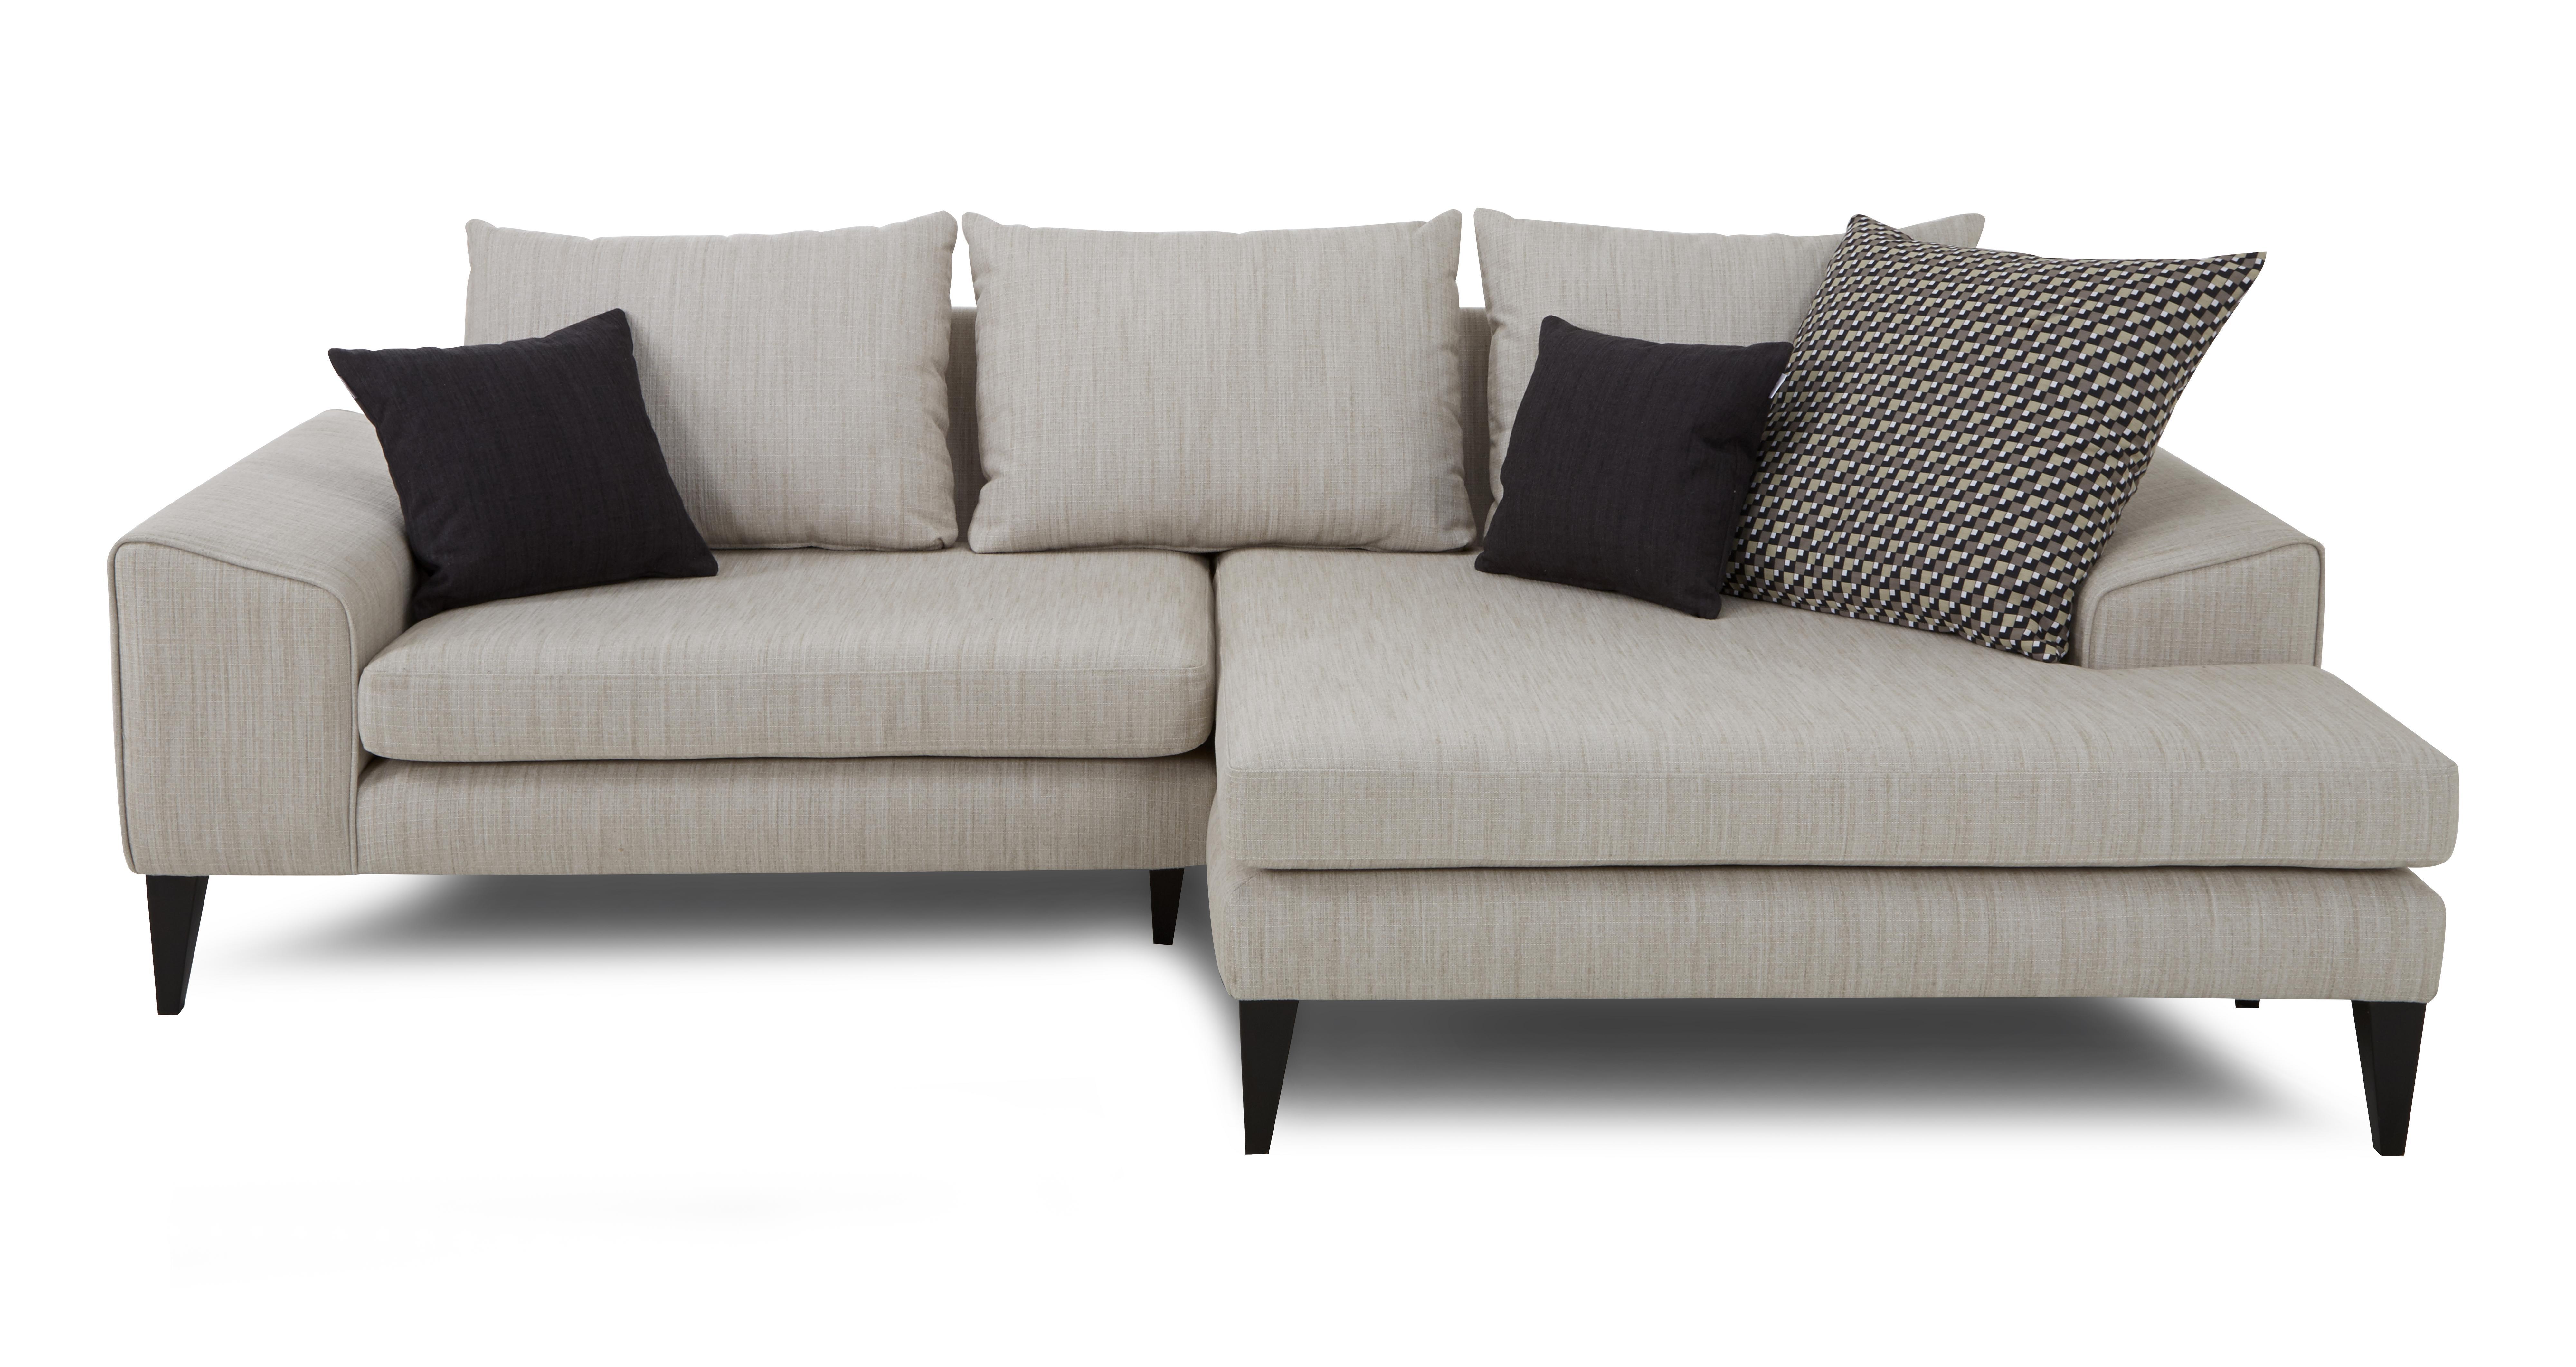 Popular Sofa ~ Comfy Grey Leather Sofa 59C3F05F5A53A1F8C1F3C375Cf42D671 For Grey Sofa Chaises (View 10 of 15)